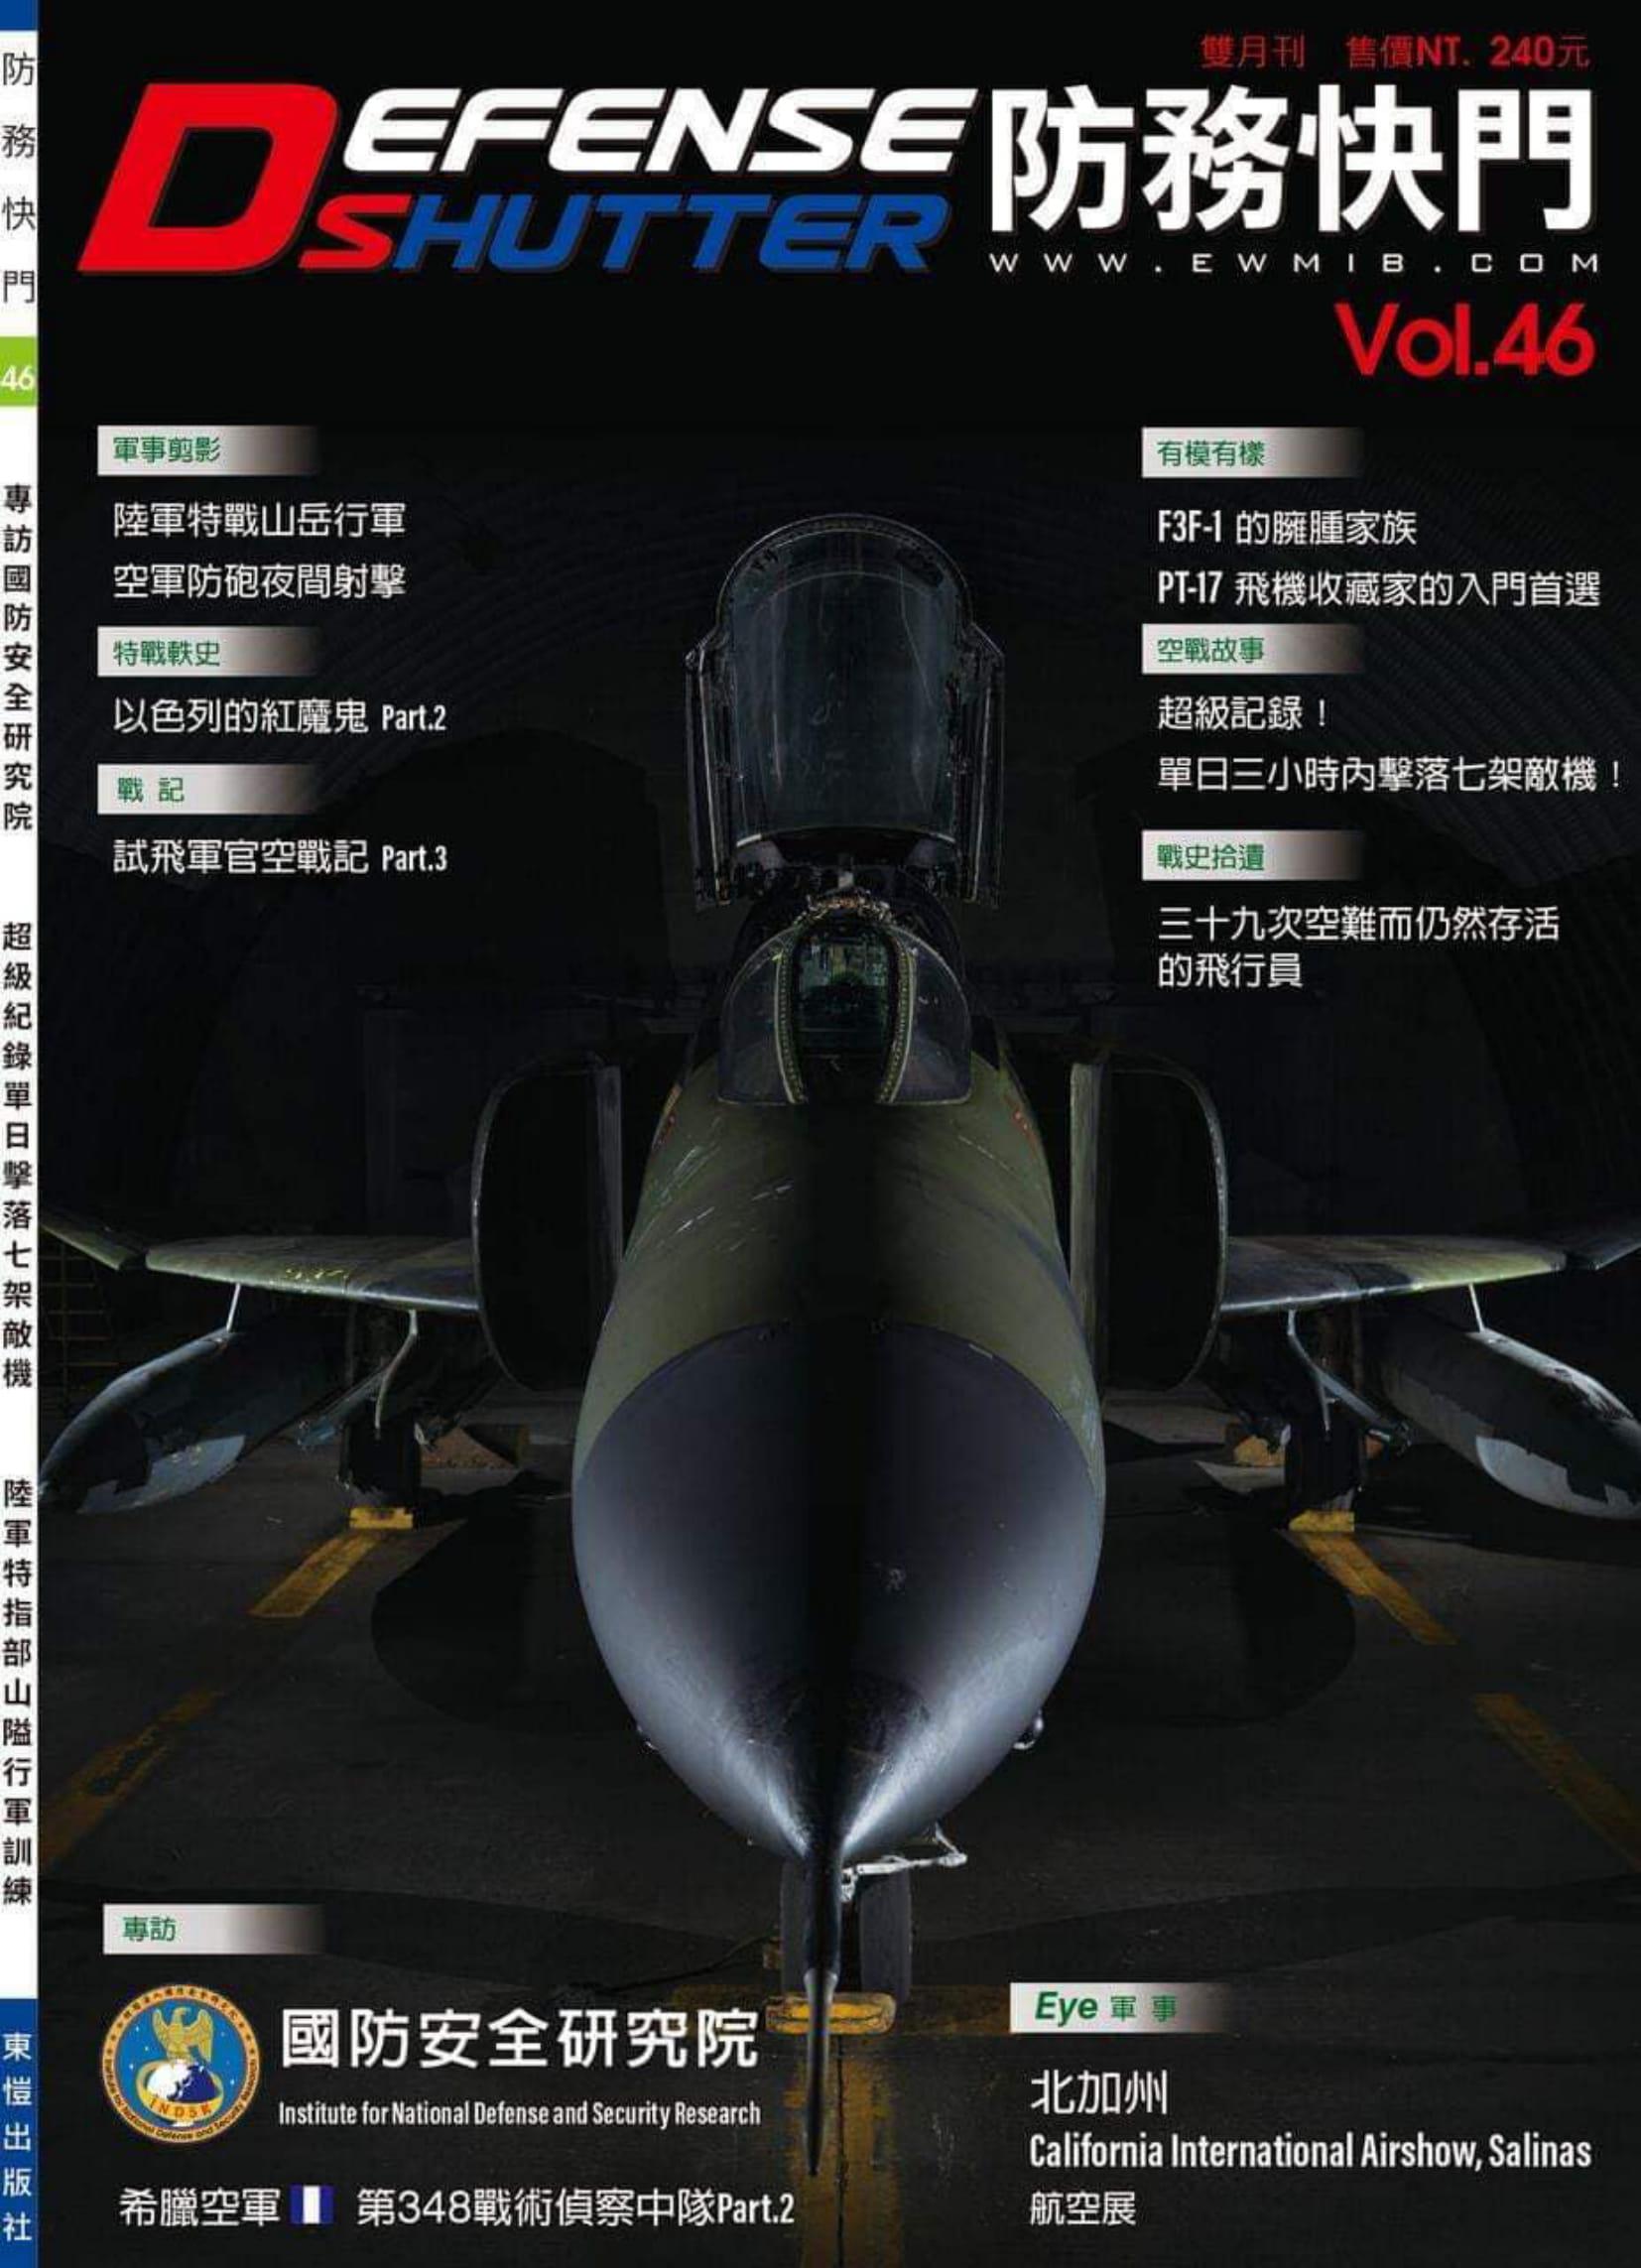 Defense Shutter (Taiwan)_RF-4E Phantoms, Larissa AB-1